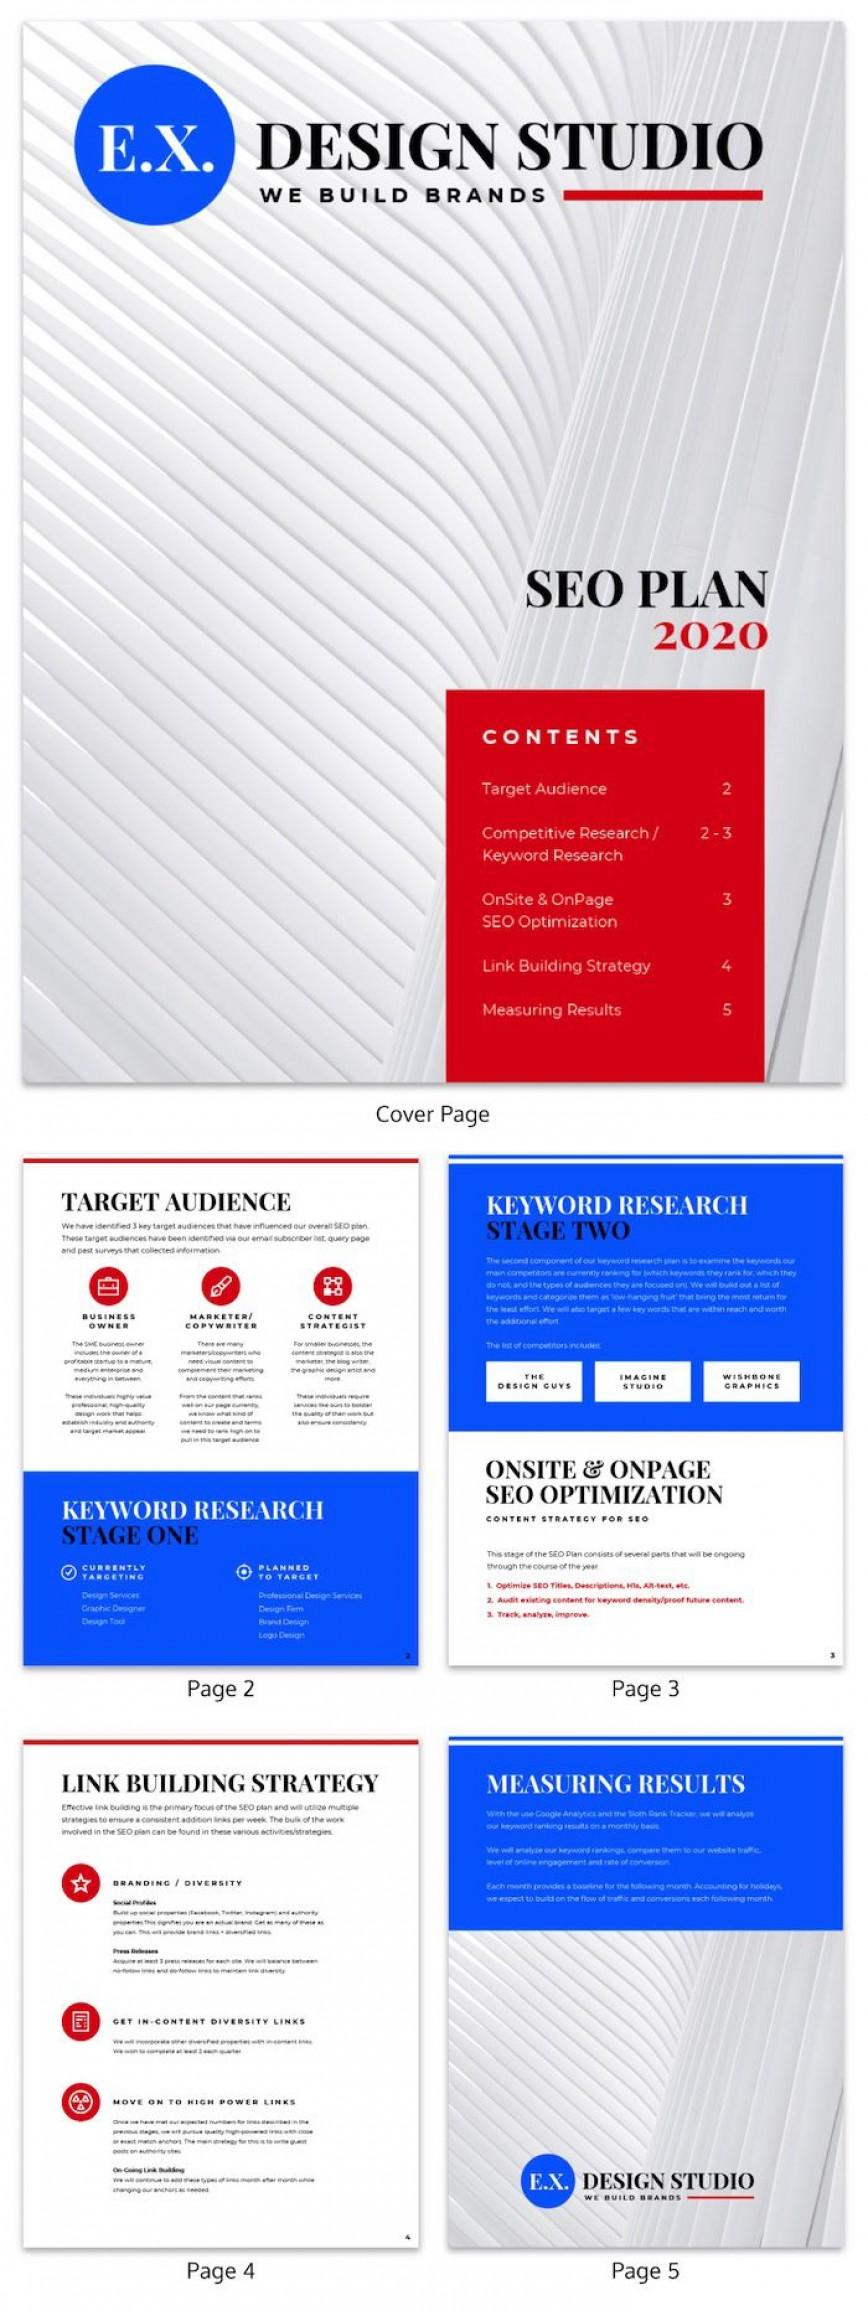 006 Fascinating Social Media Marketing Plan Template 2018 High Definition